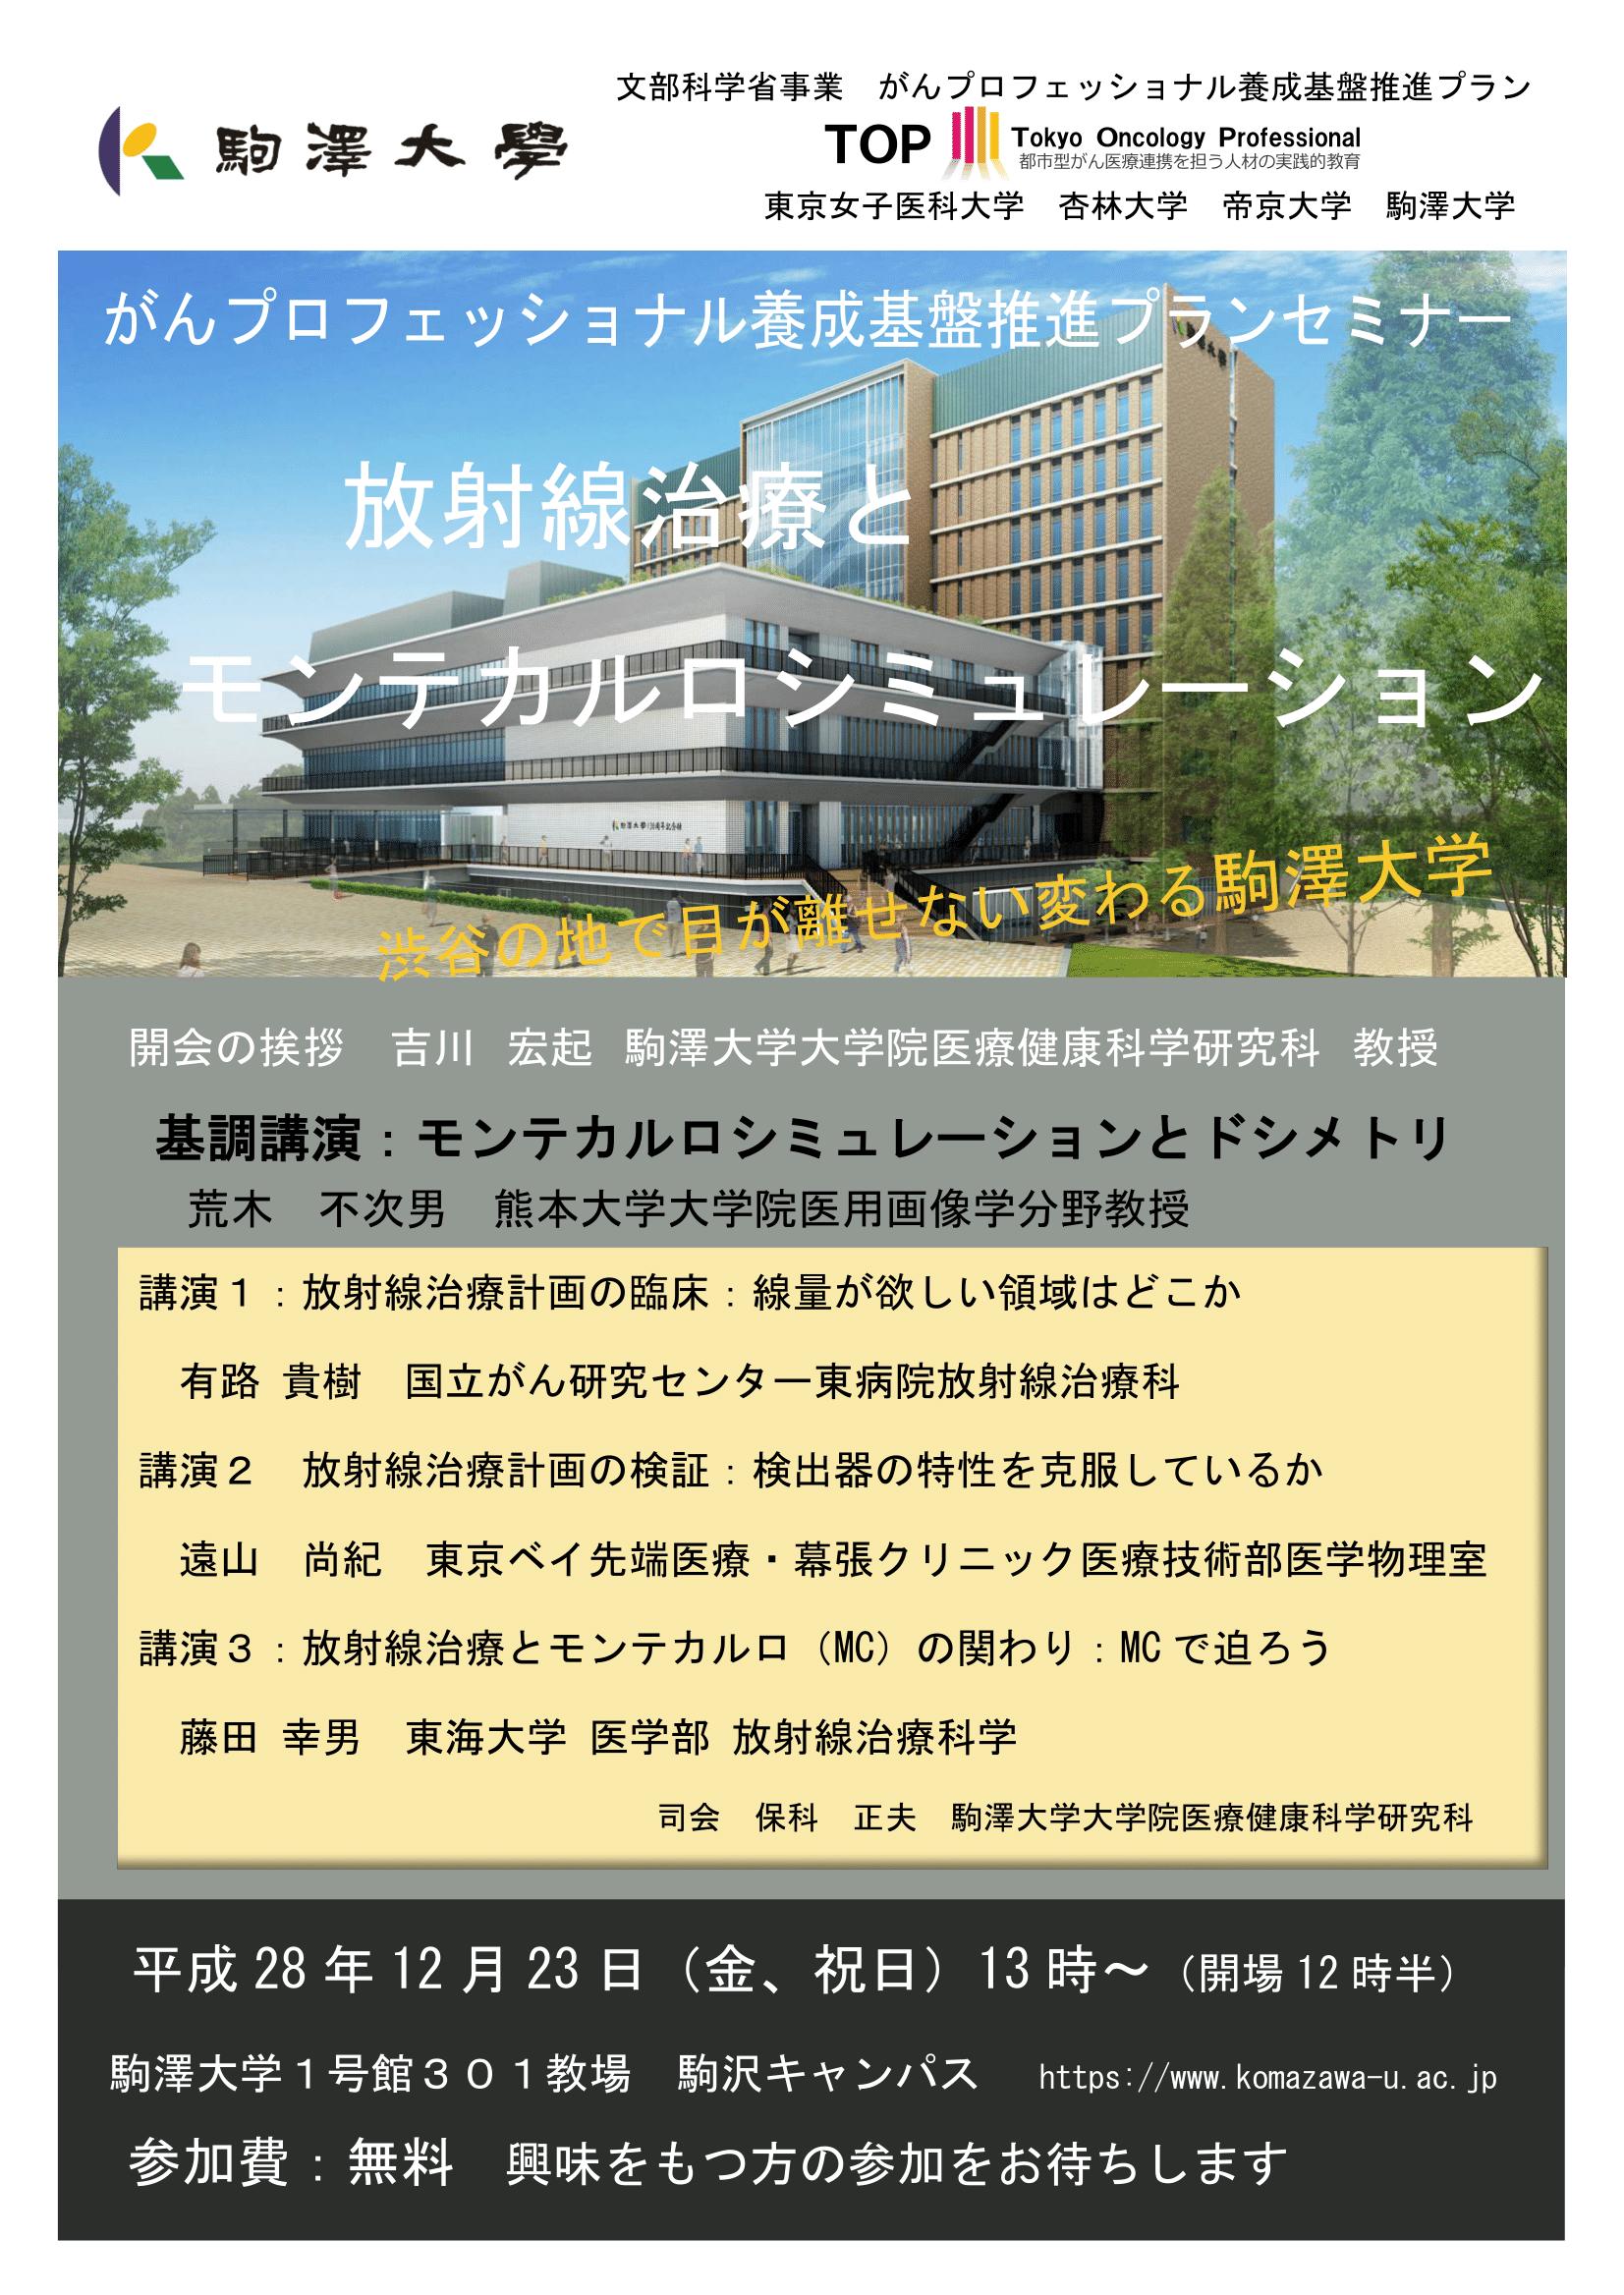 https://www.komazawa-u.ac.jp/about/files/3d0b331b9dbfe2078487eba81ae03881.png